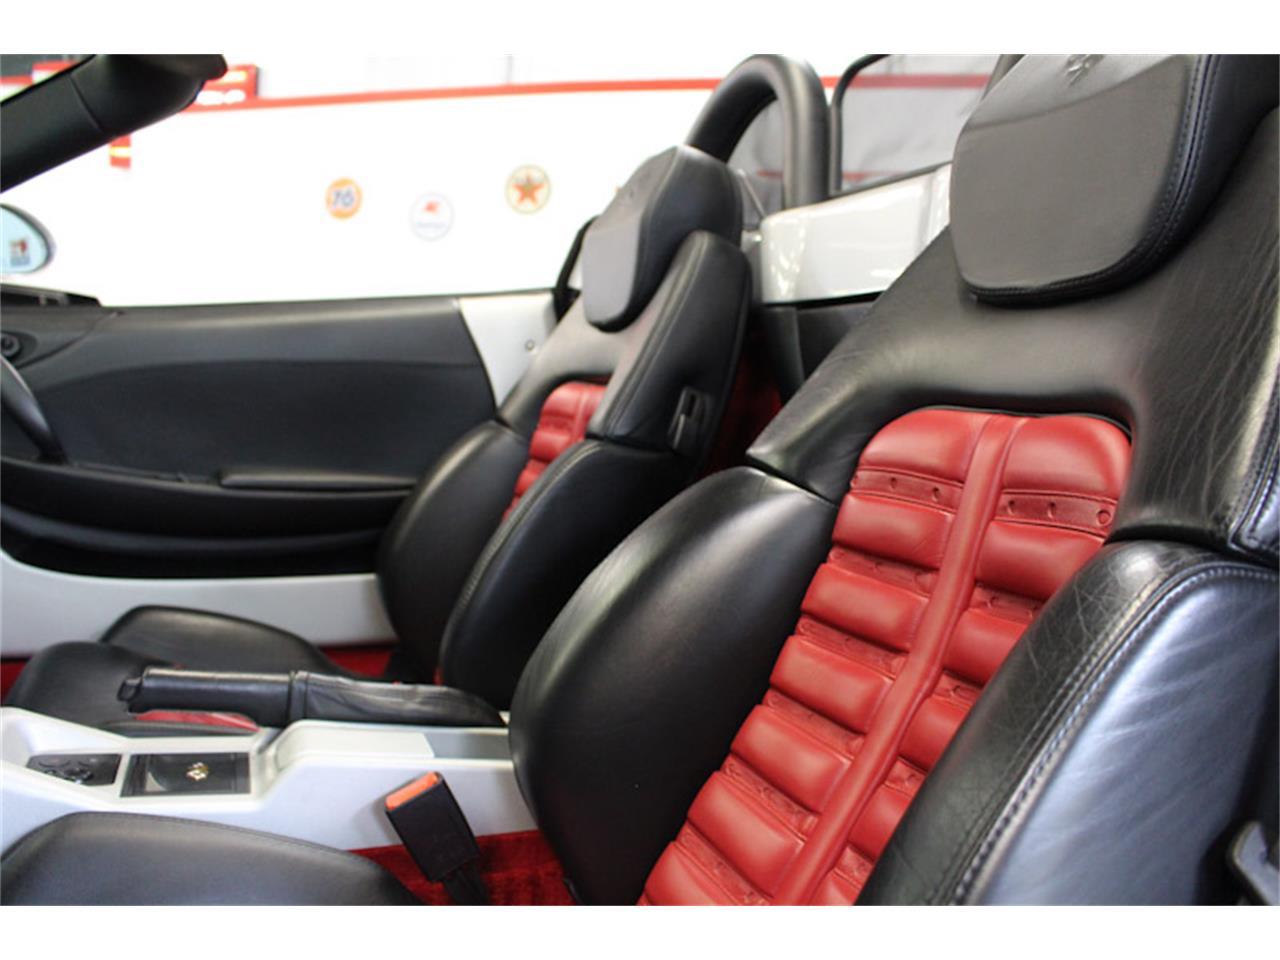 2000 Ferrari 360 (CC-1097330) for sale in Fairfield, California